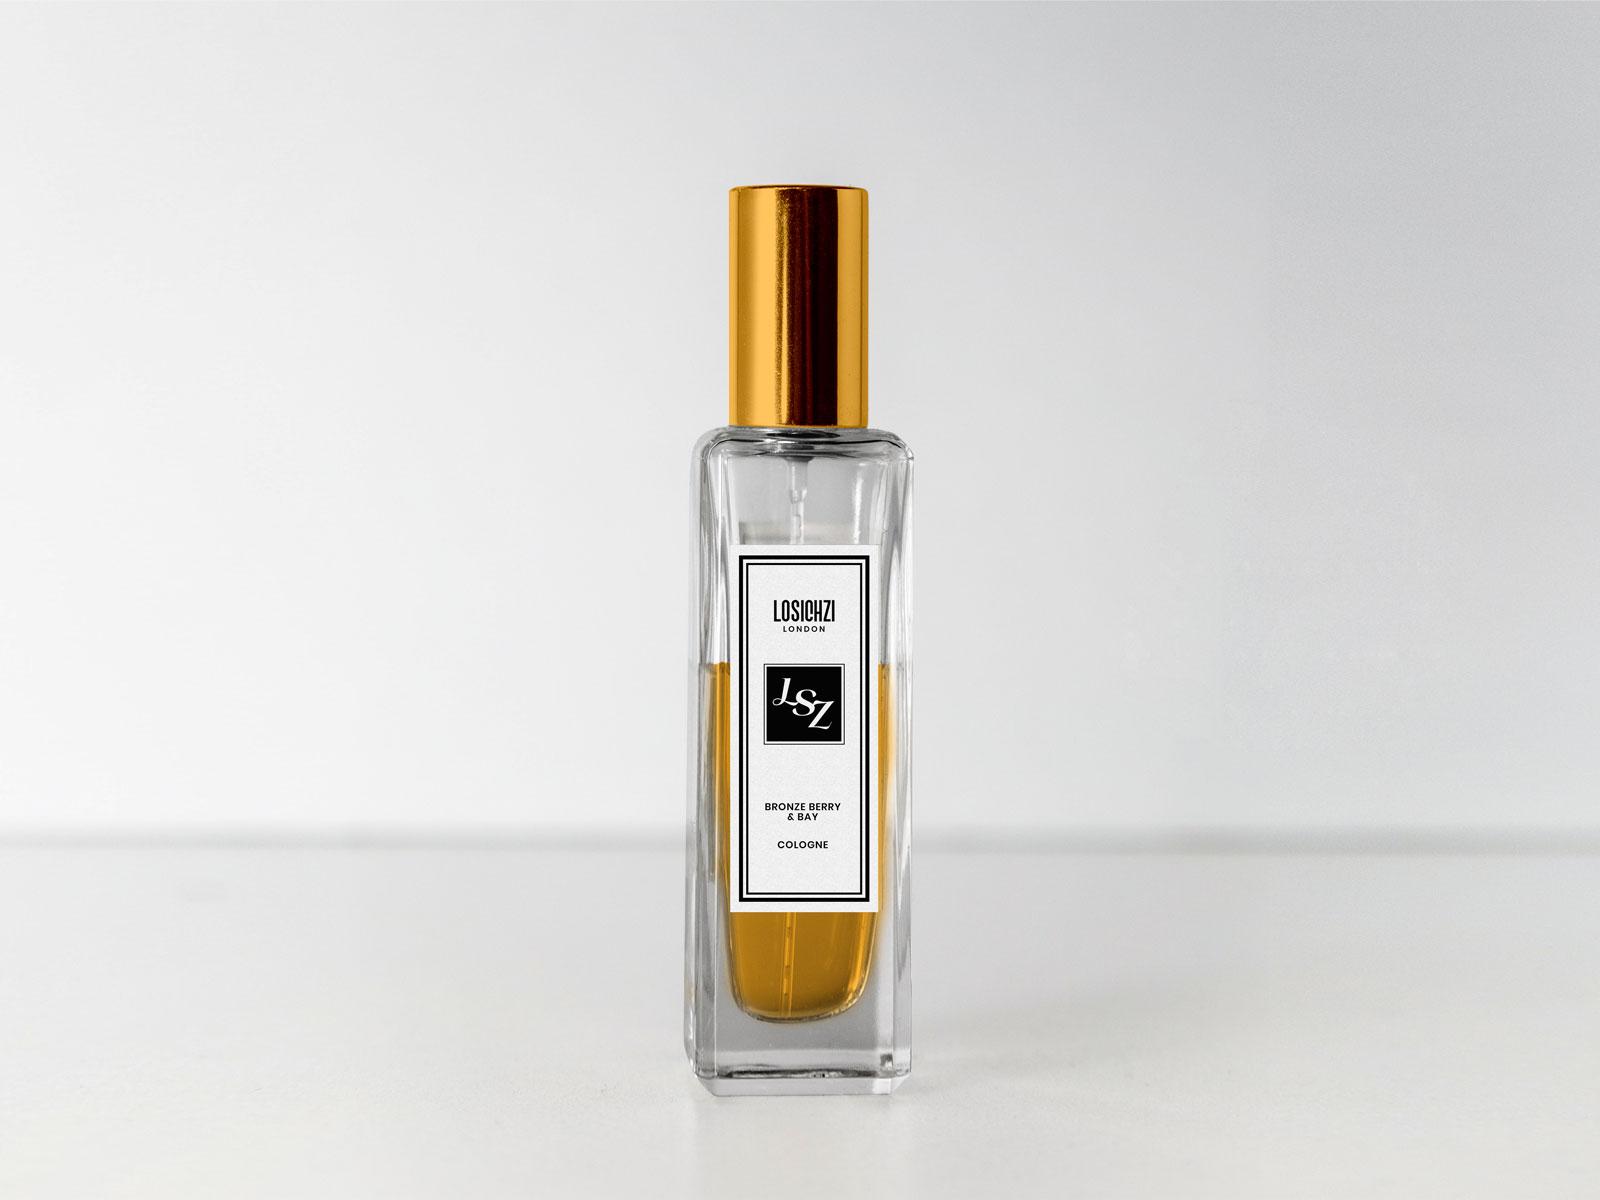 Free Perfume Scent Bottle Mockup